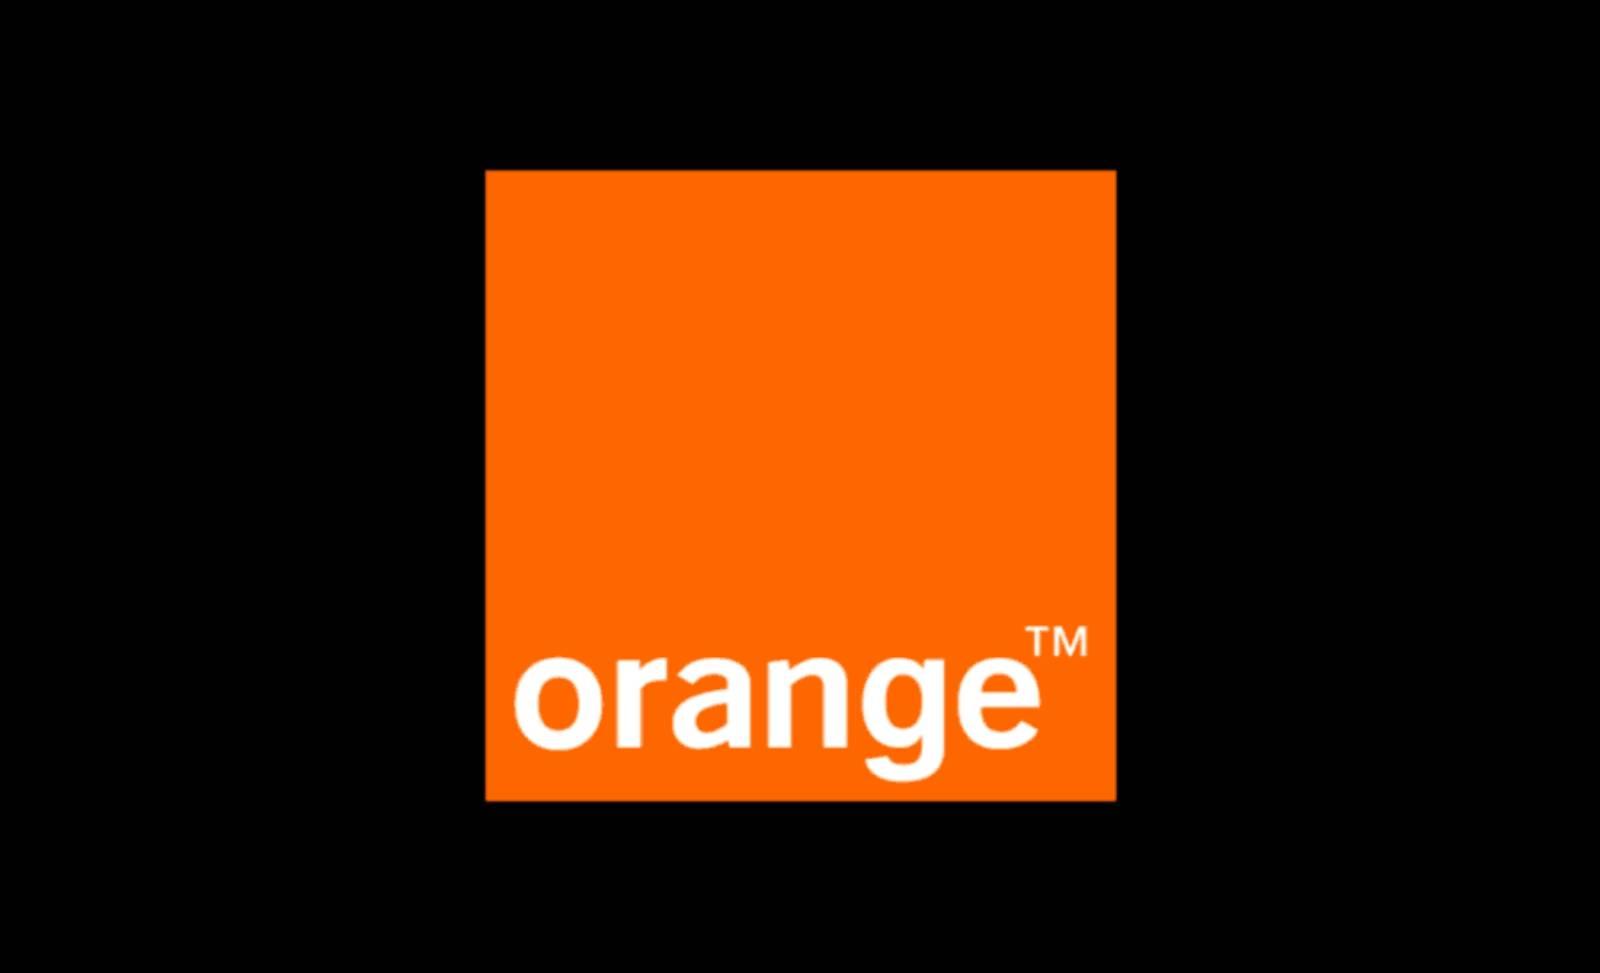 orange final